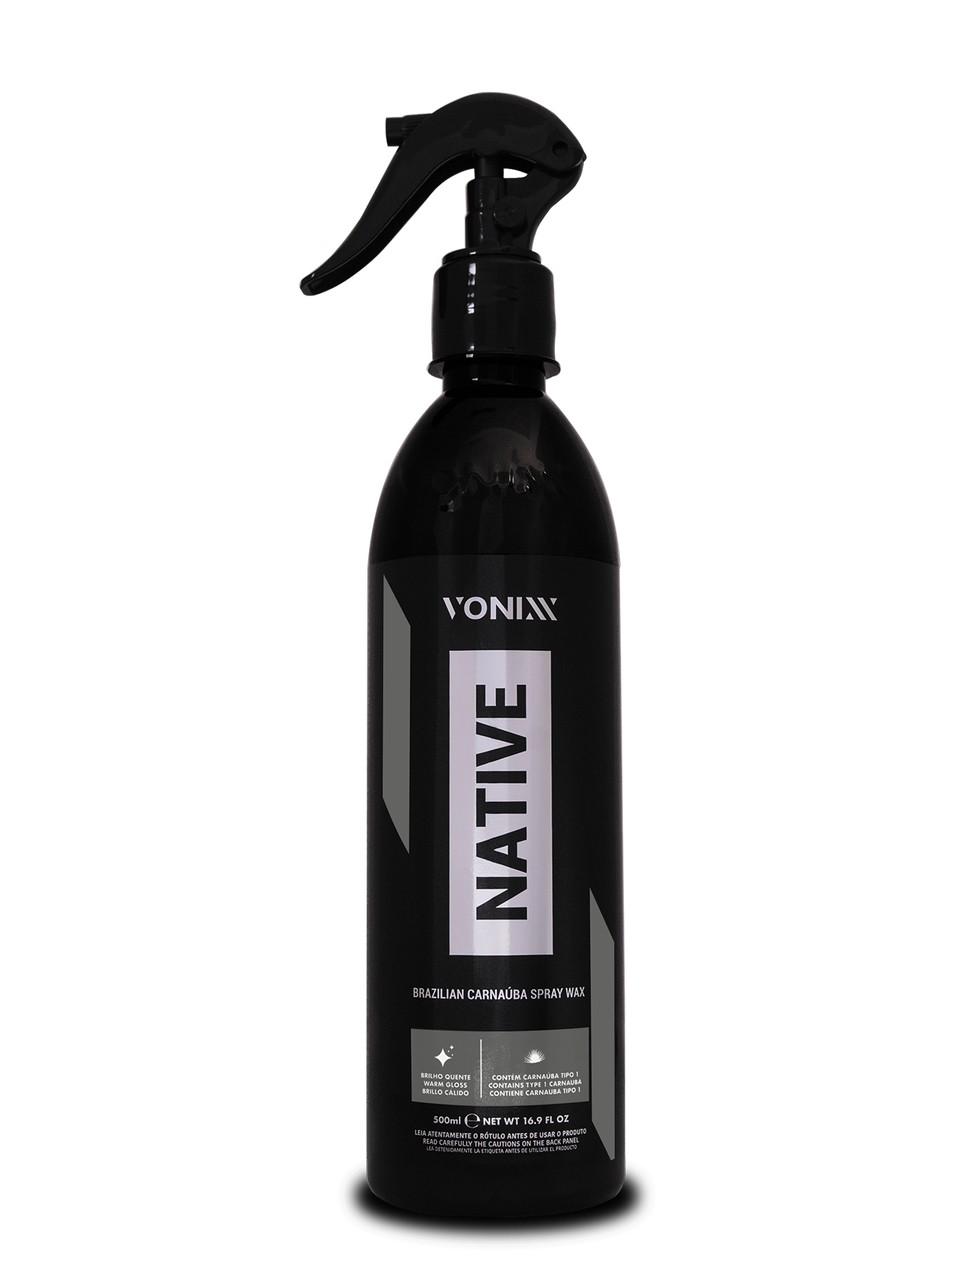 Native Wax Cera de Carnaúba Spray 500ml Vonixx